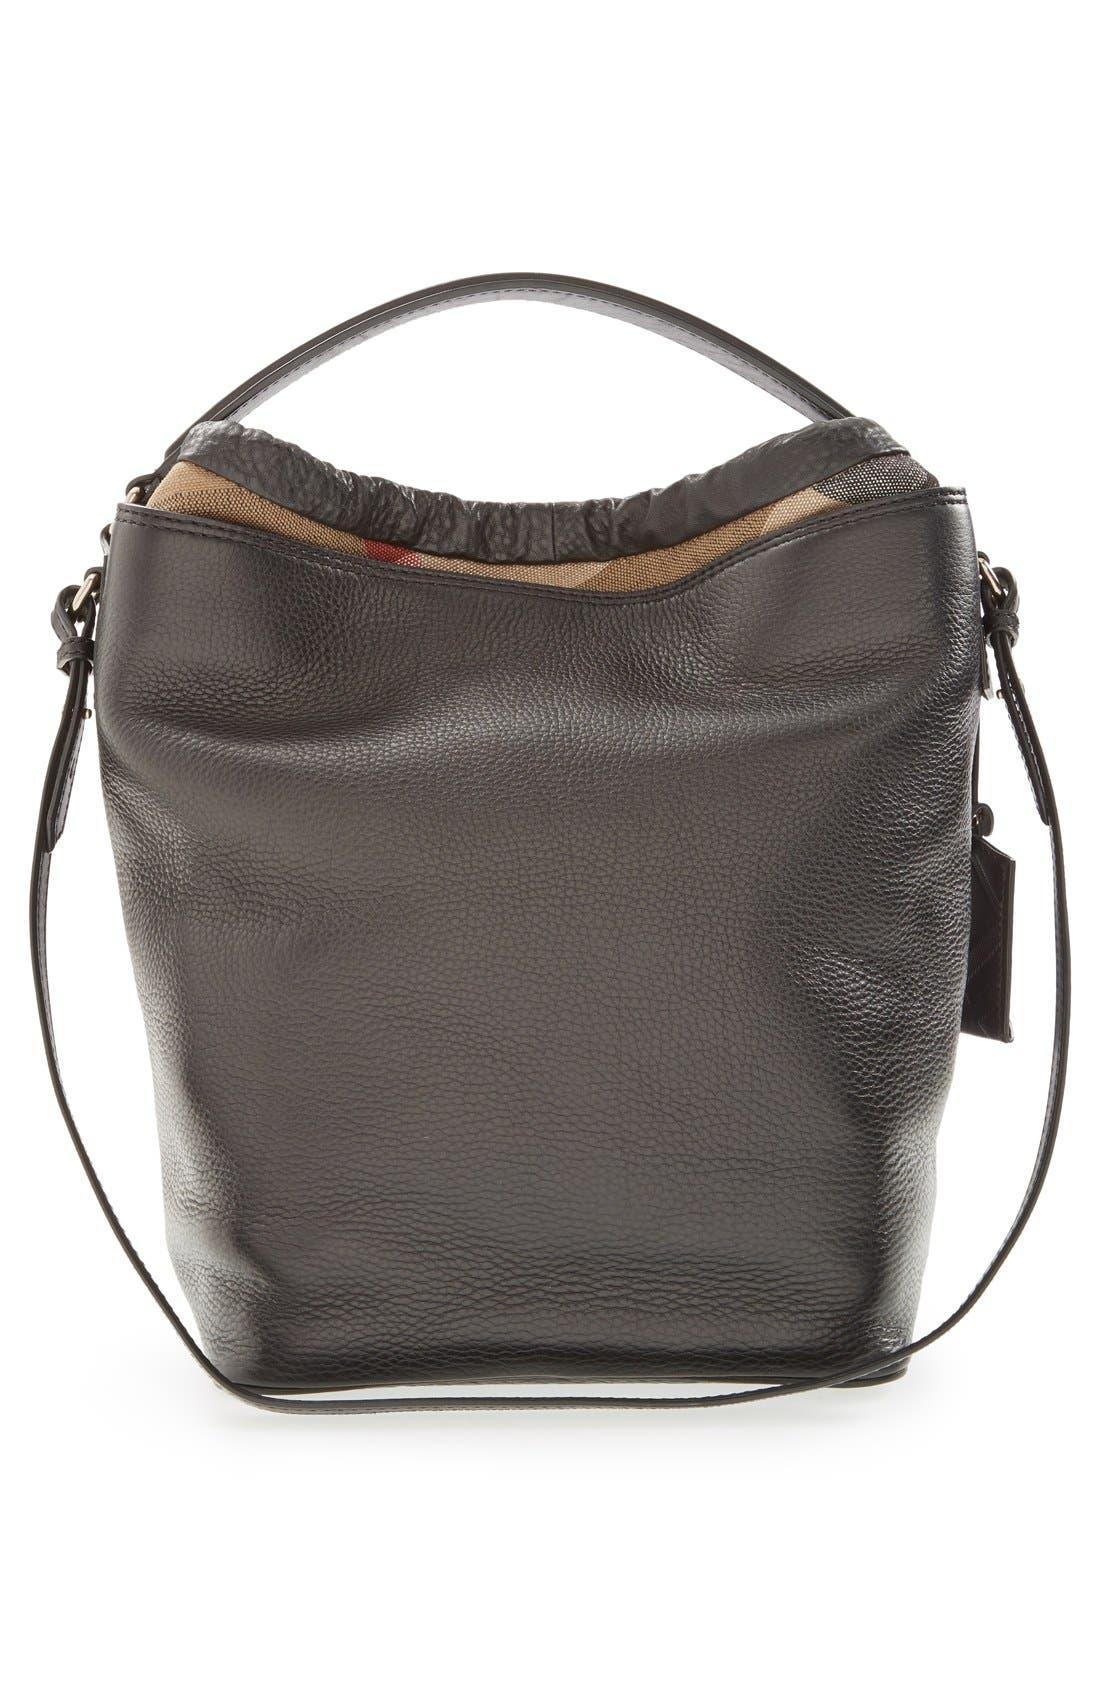 Brit 'Medium Susanna' Leather & Canvas Check Hobo Bag,                             Alternate thumbnail 2, color,                             001